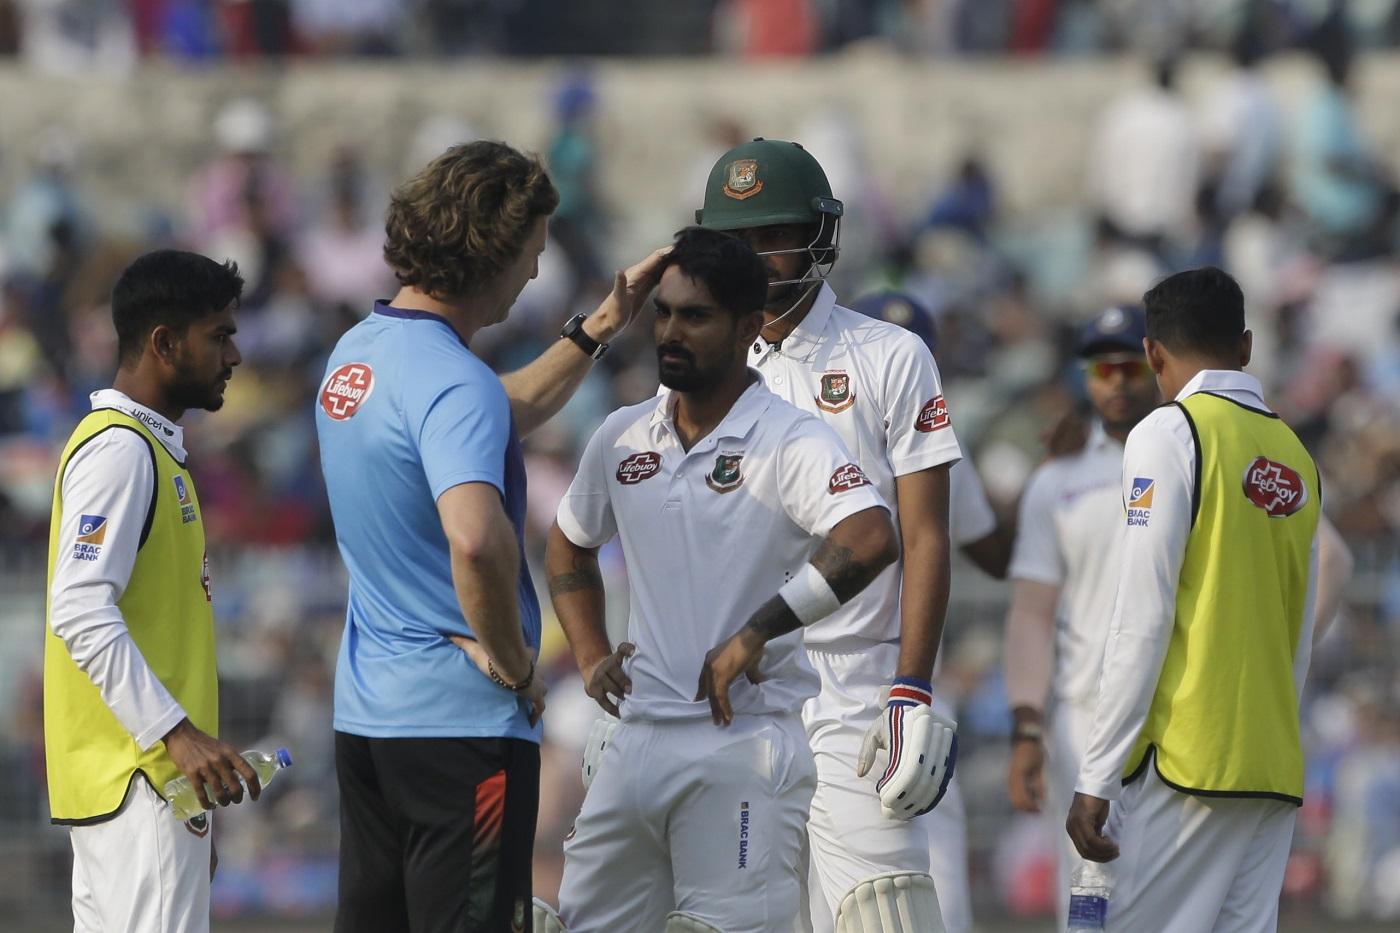 Full Scorecard of Bangladesh vs India 2nd Test 2019 - Score Report | ESPNcricinfo.com